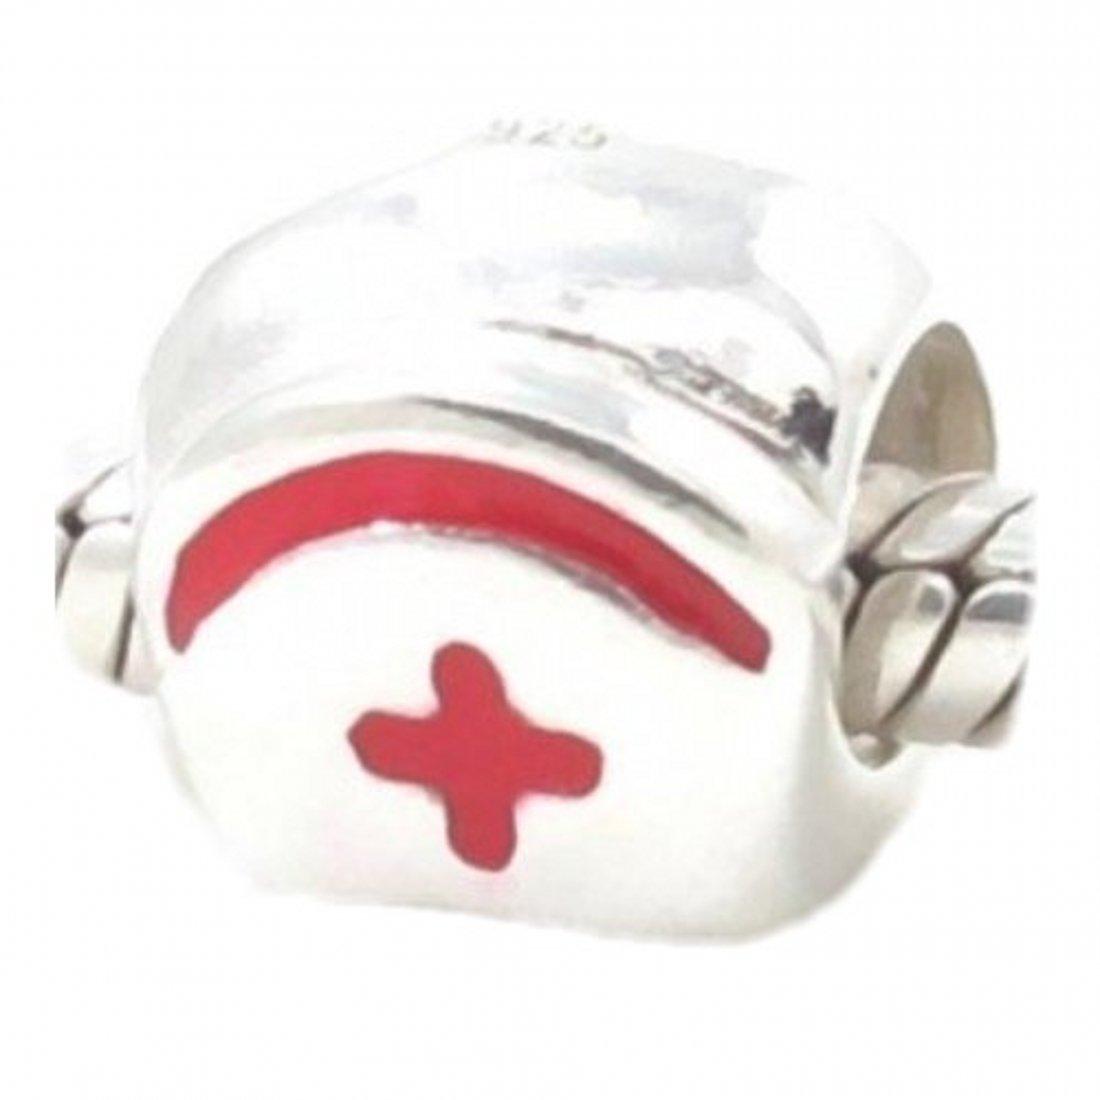 f4fa62596 Amazon.com: Beads Hunter Jewelry Nurse Hat Solid Silver European Bead Charm  Fits Pandora Biagi Troll Chamilia Bracelets (Red): Jewelry